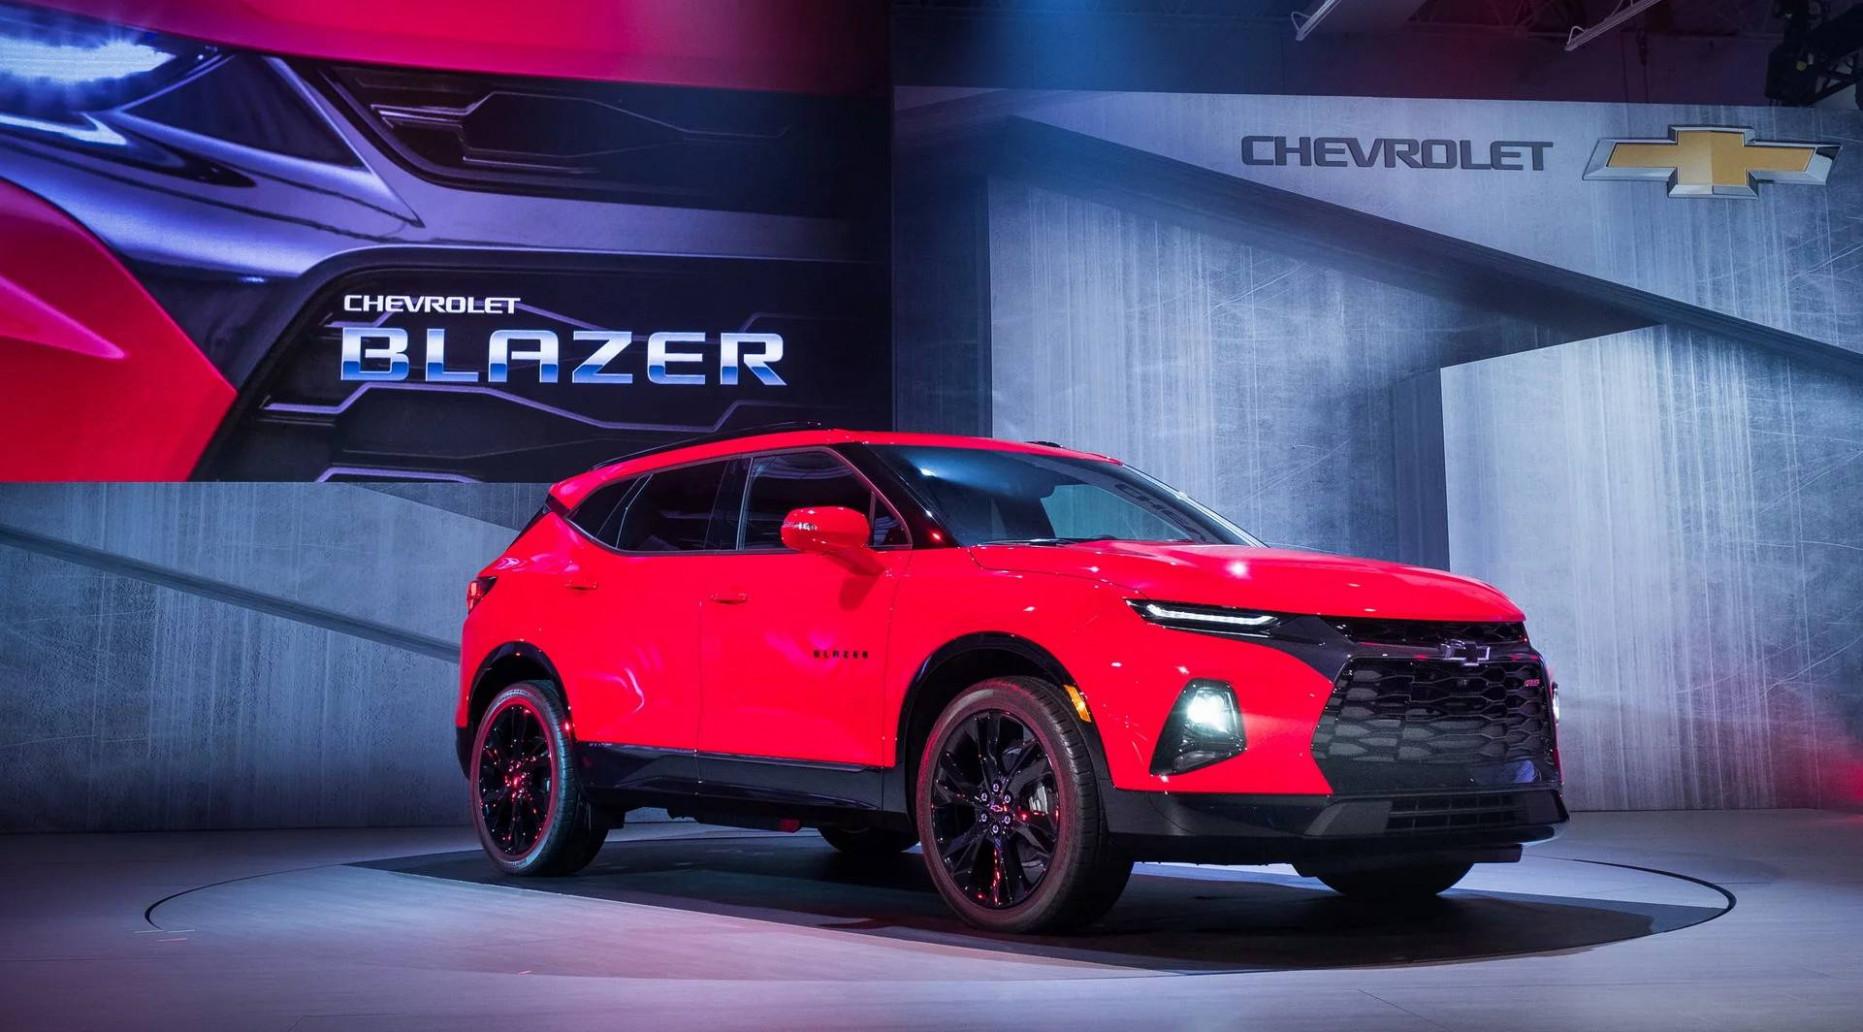 Images Chevrolet Blazer 2022